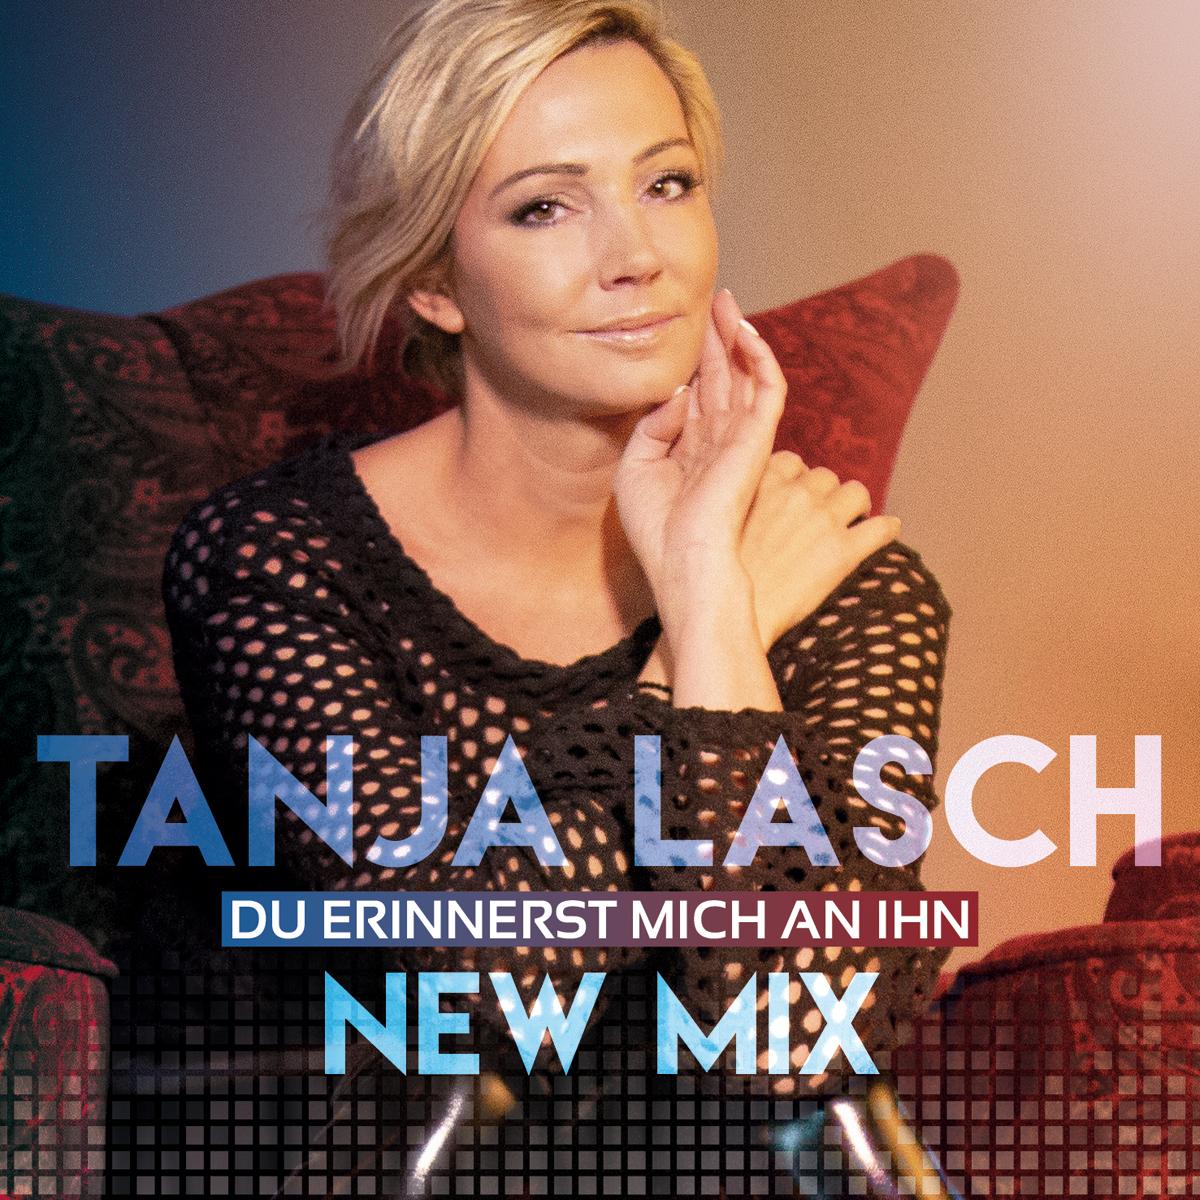 Tasnja Lasch - Du erinnerst mich an ihn (New Mix) (2021)